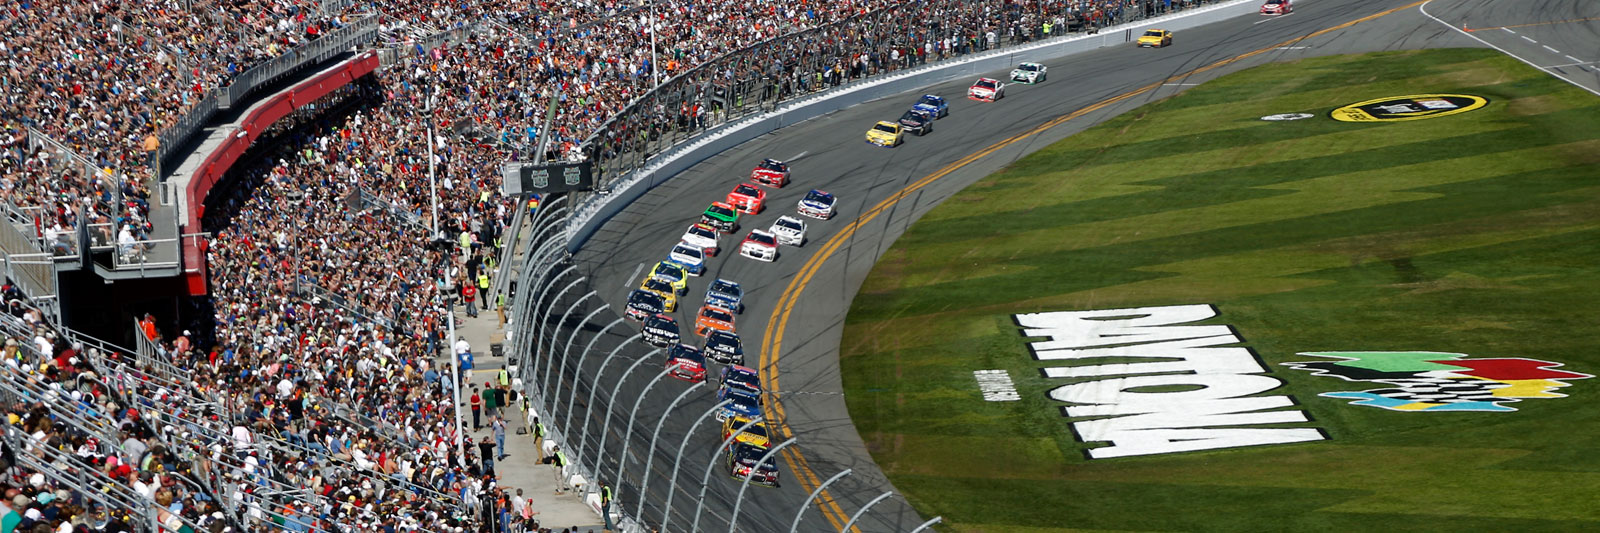 Daytona 500 with Grand Prix Tours